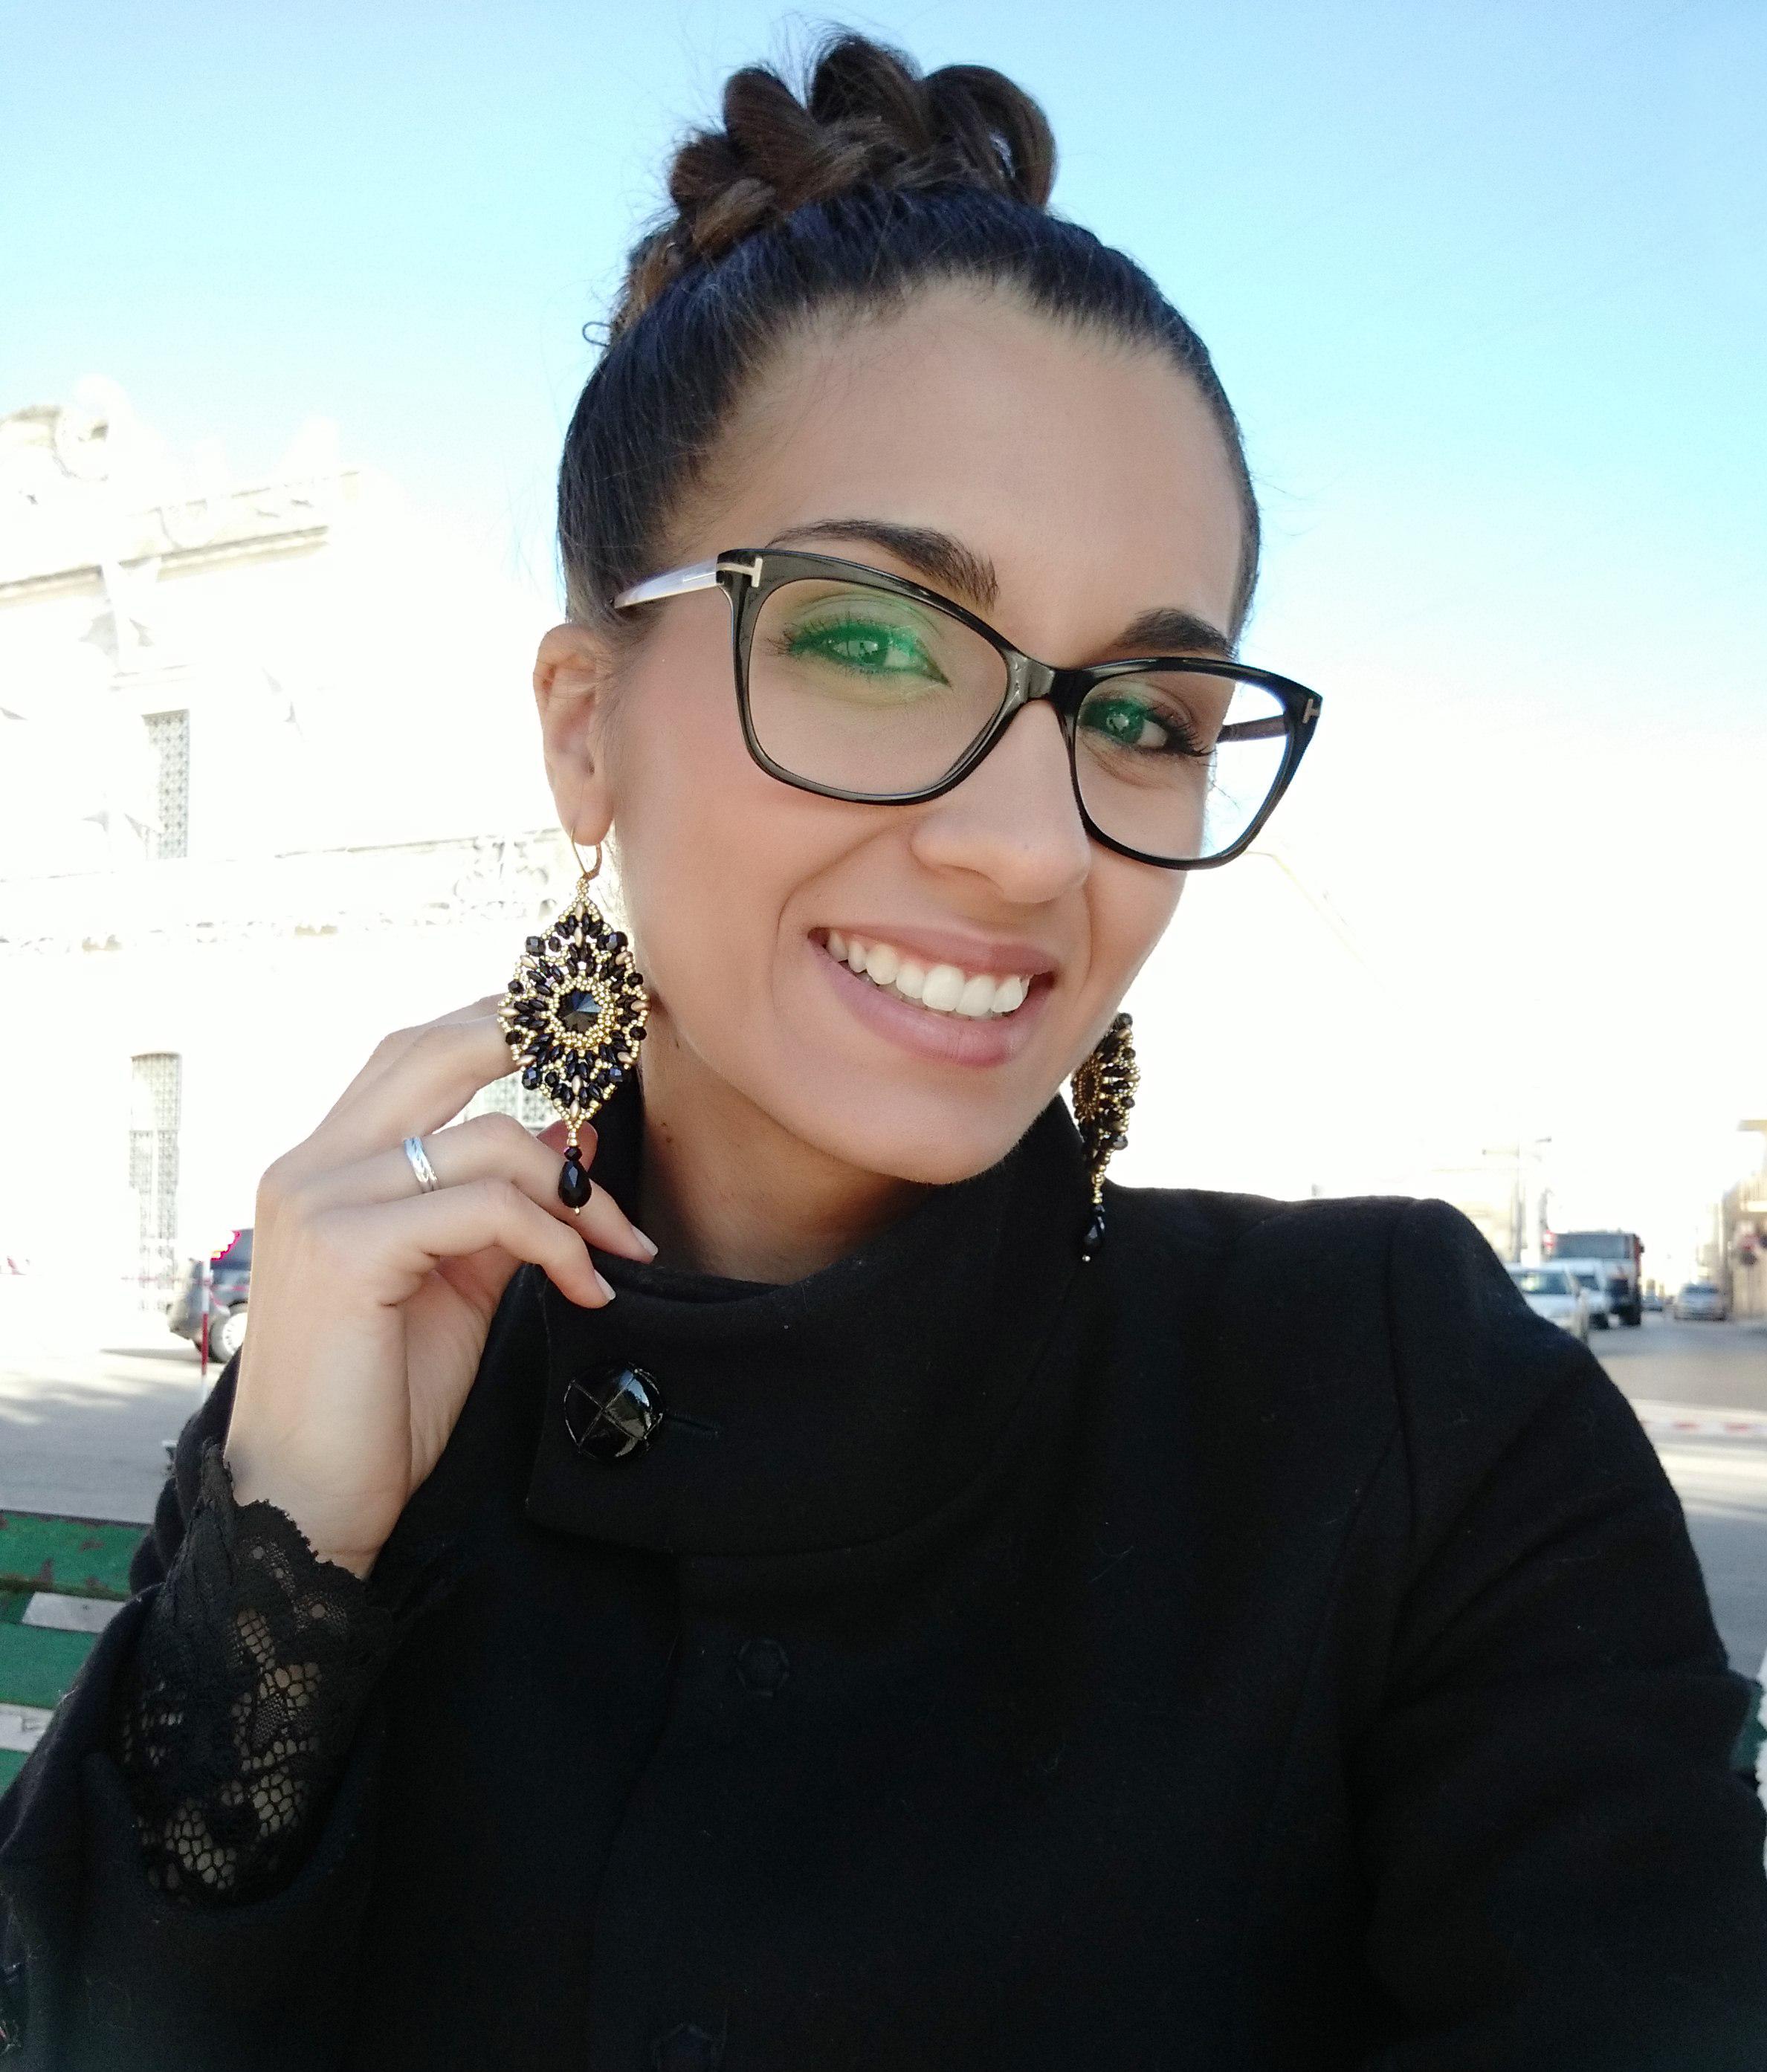 MARTINA DE PASCALI - PRODUZIONE DI BOOK-TRAILER